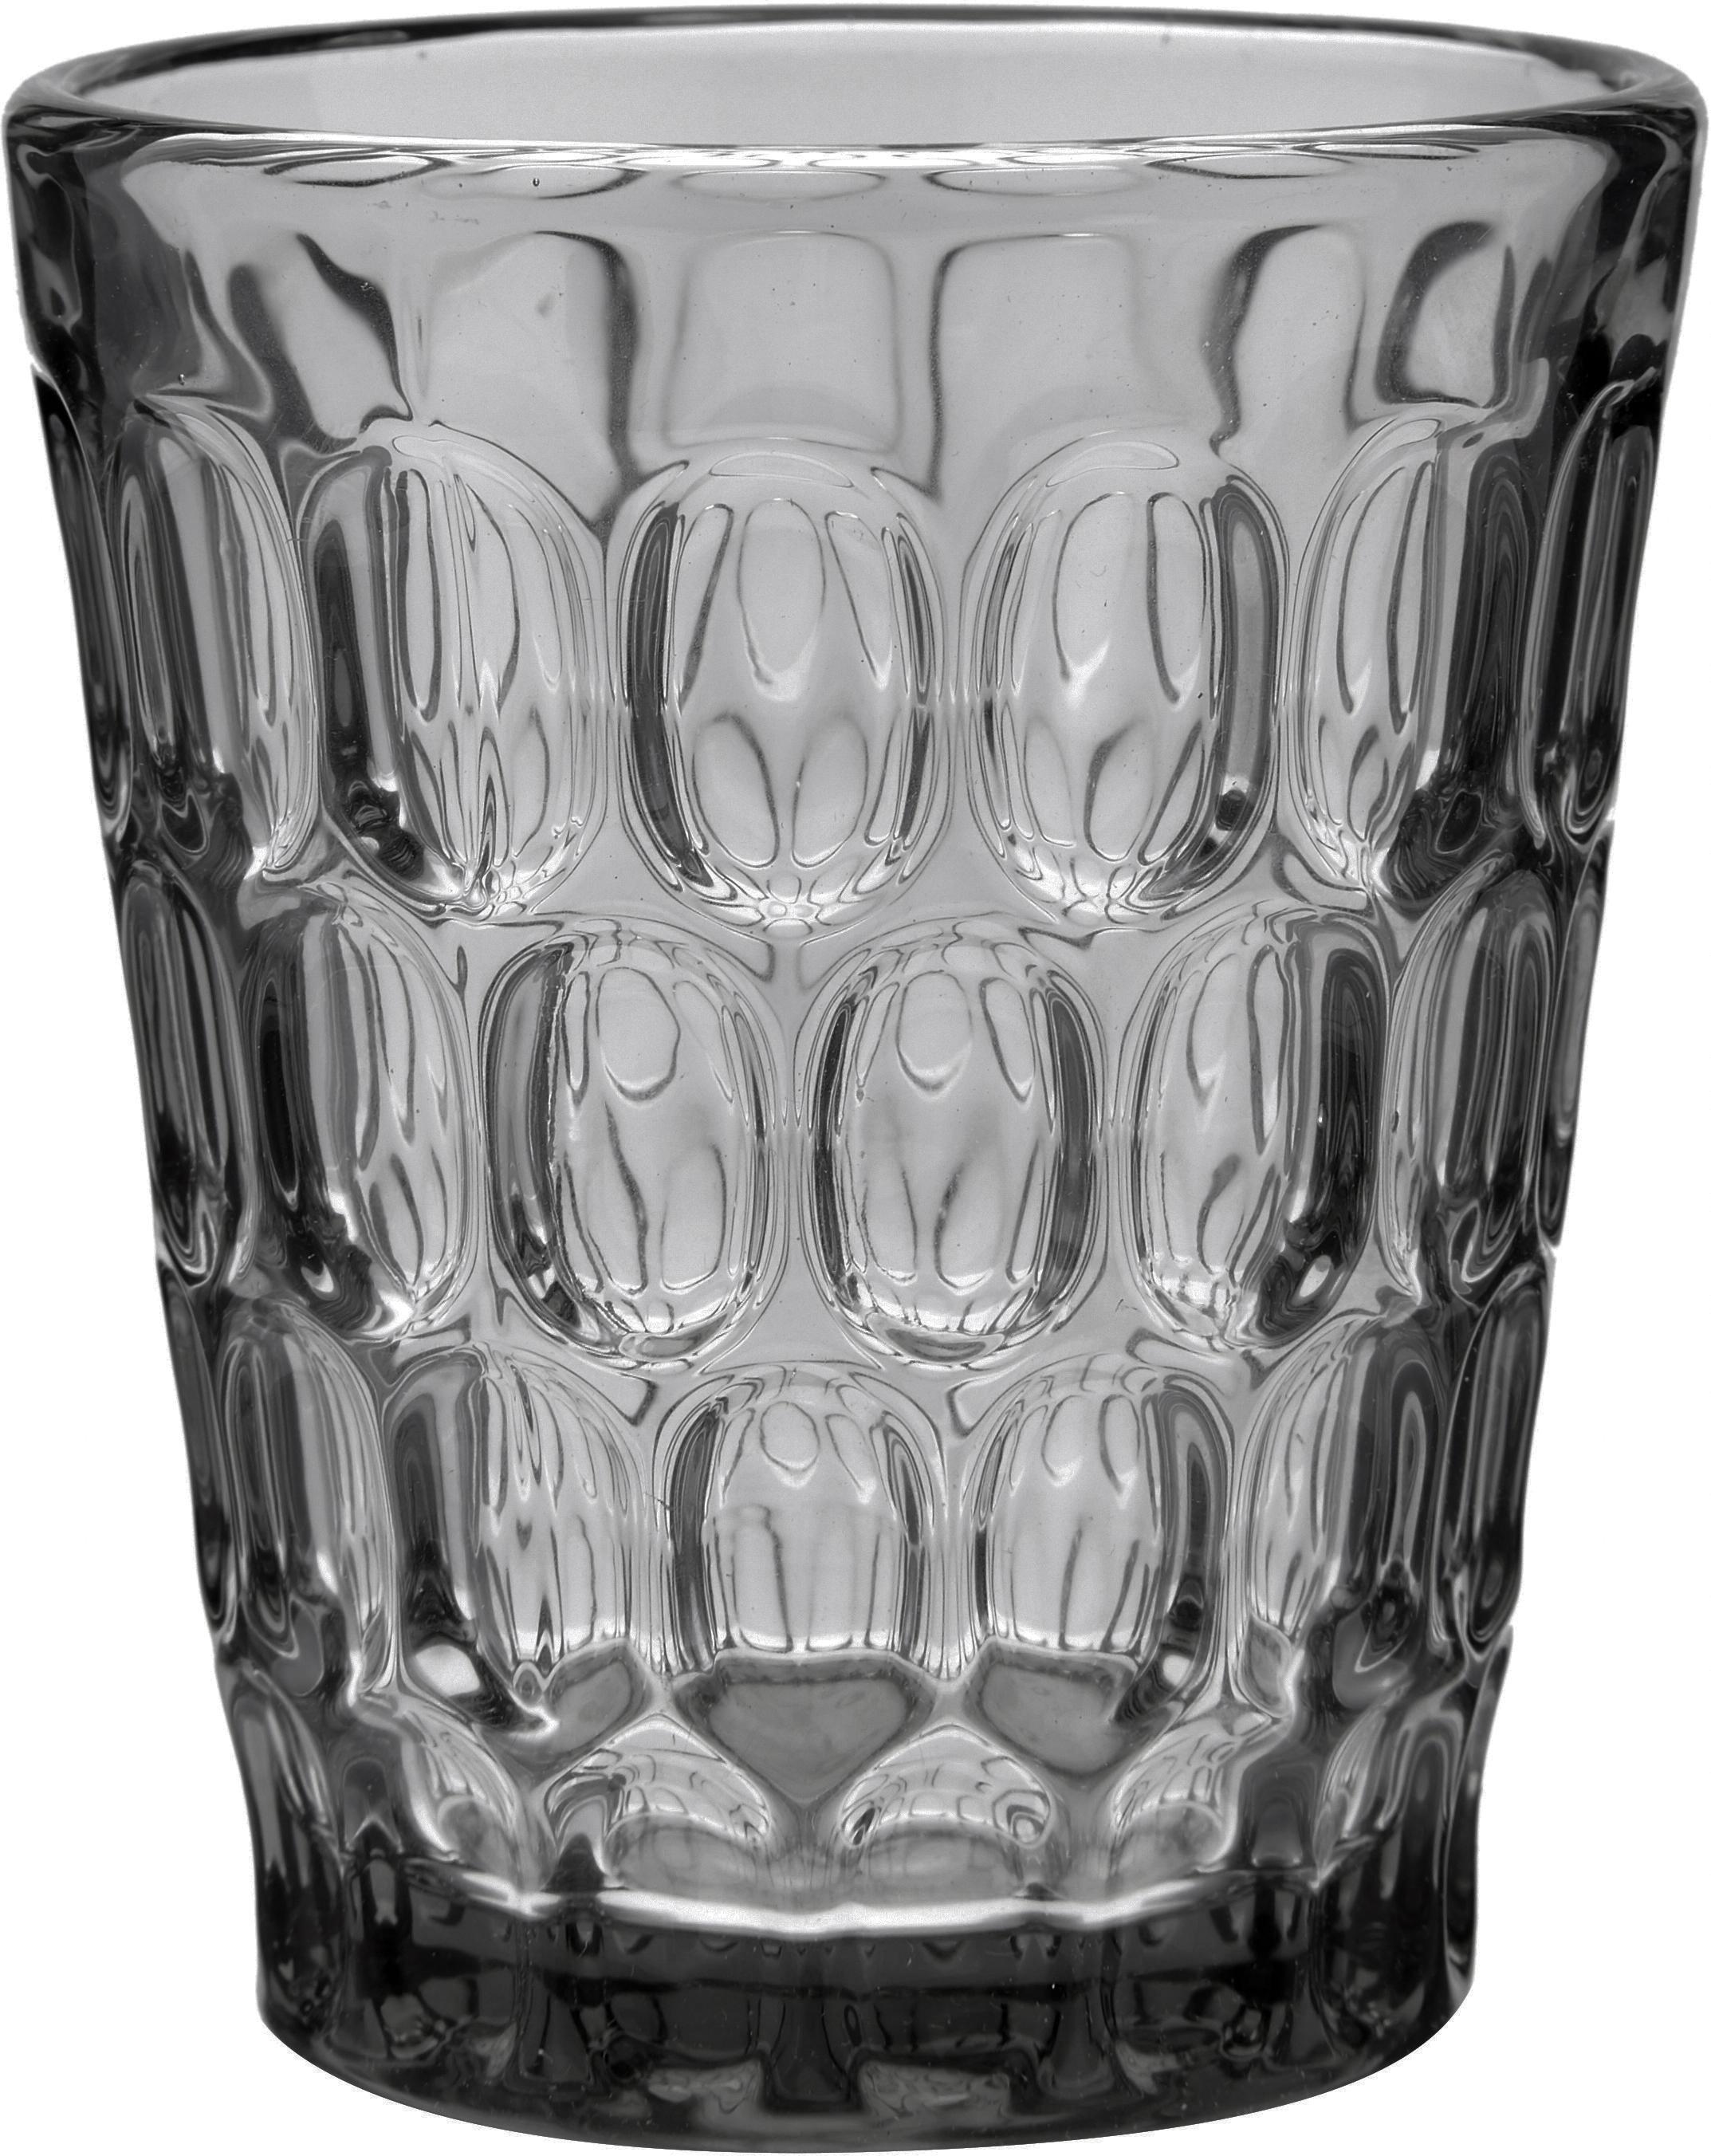 Vasos resistentes con relieve Optic, 6uds., Vidrio, Gris, transparente, Ø 9 x Al 11 cm